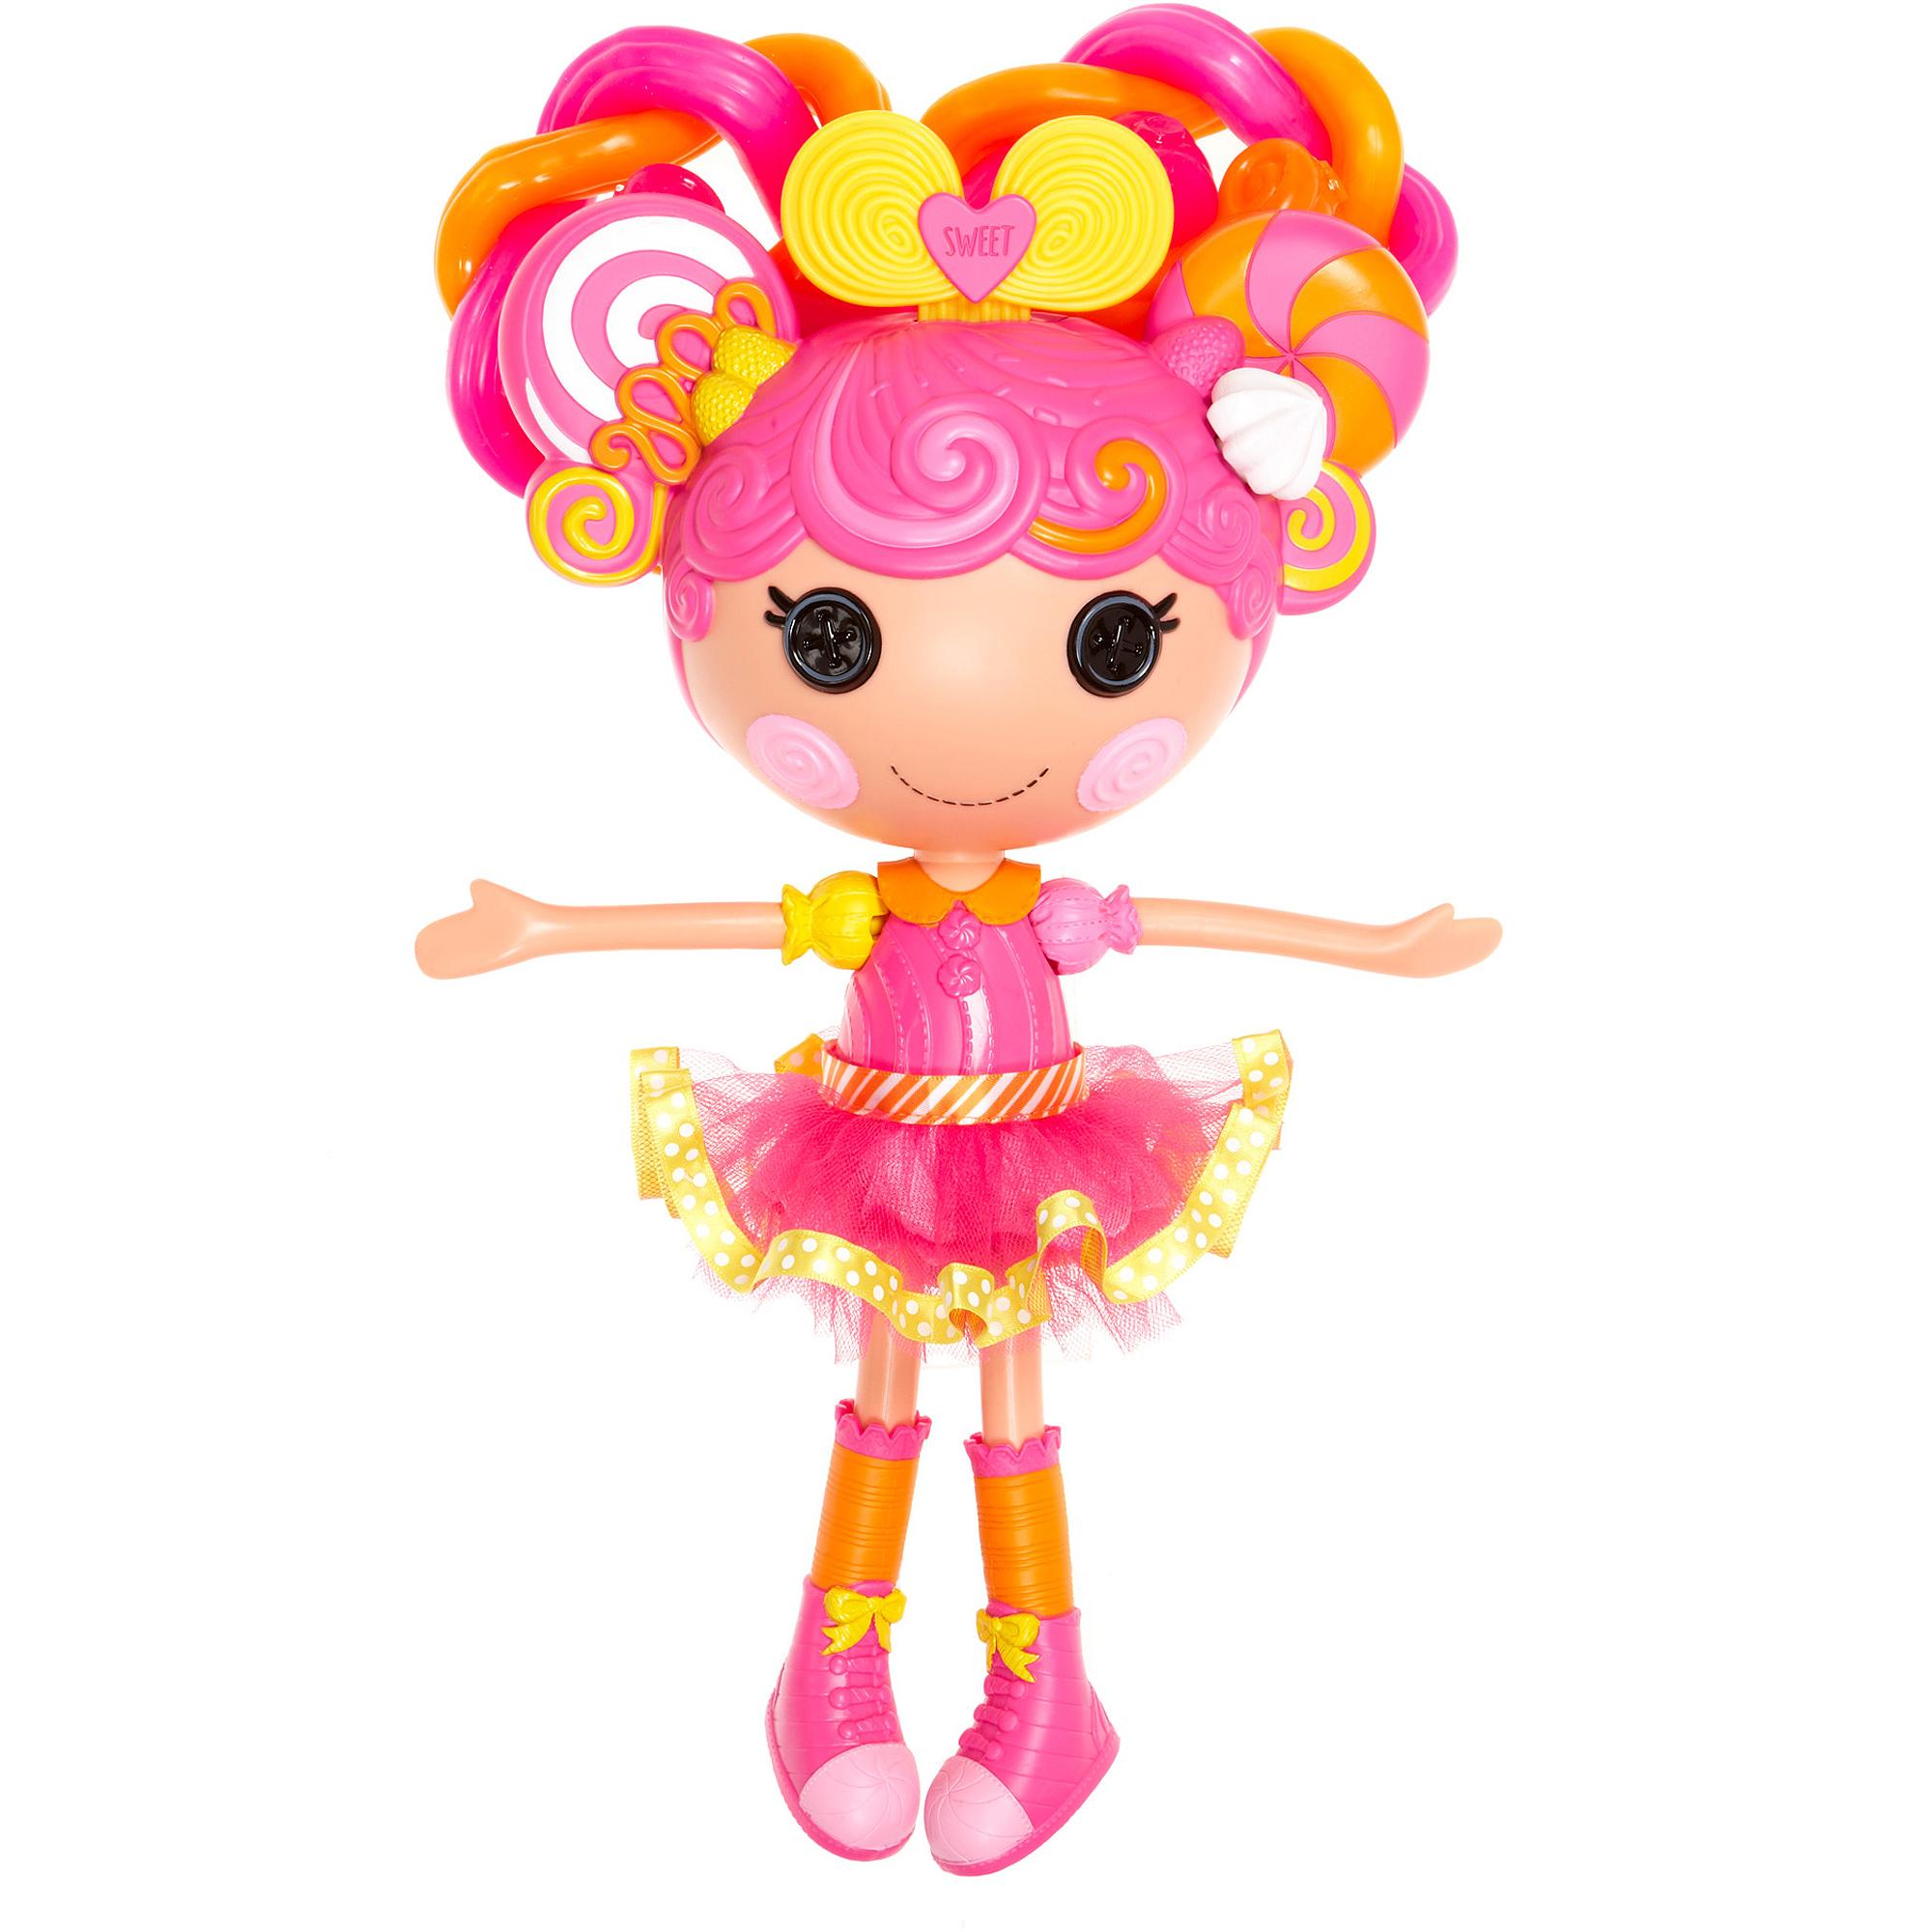 Doll clipart loopsy  Hair Whirly Doll Walmart